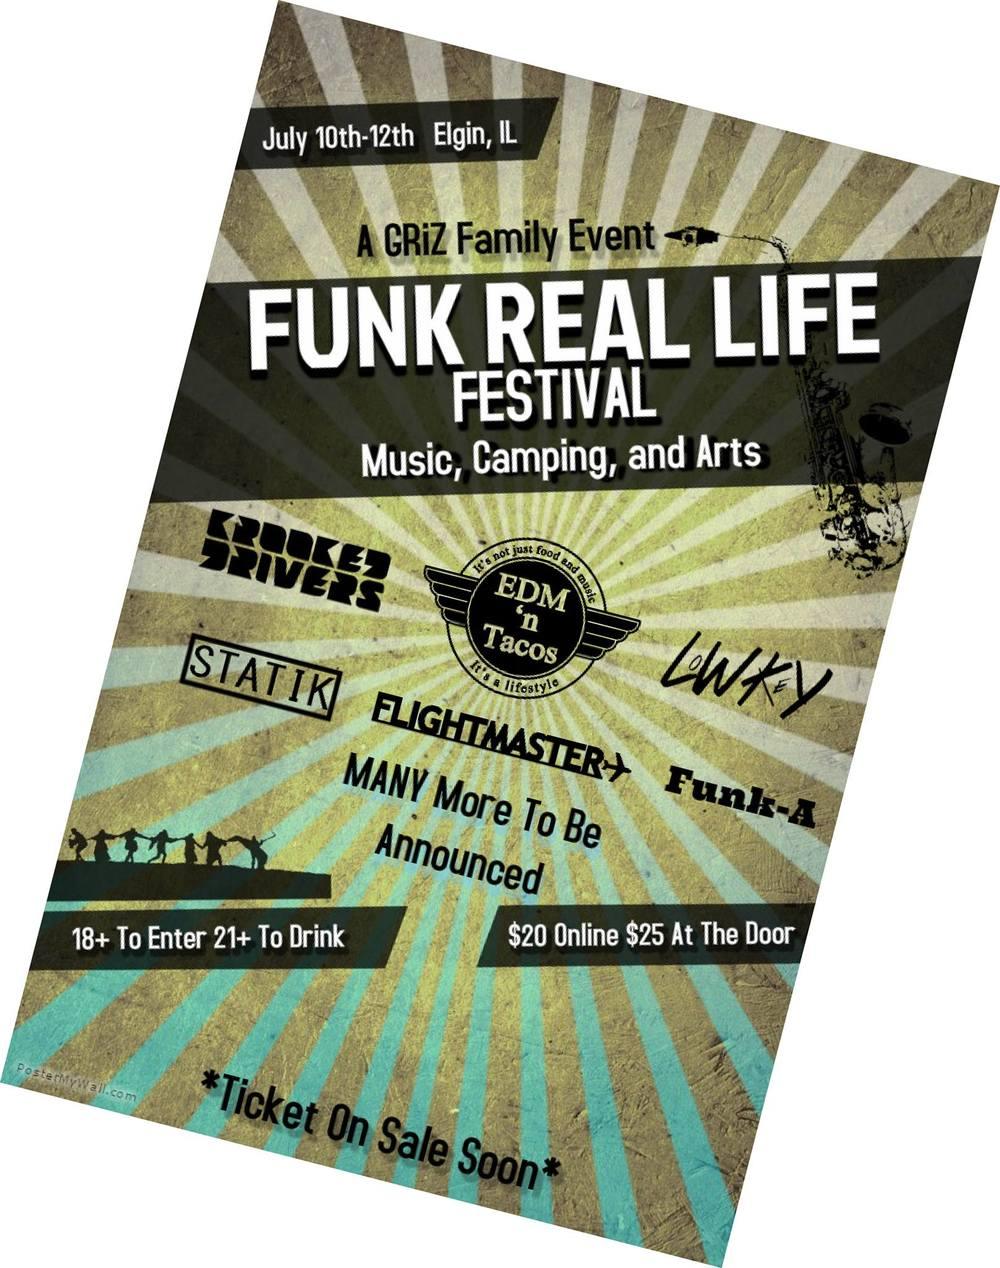 Funk Real Life Festival 7:10 - 7:12.jpg